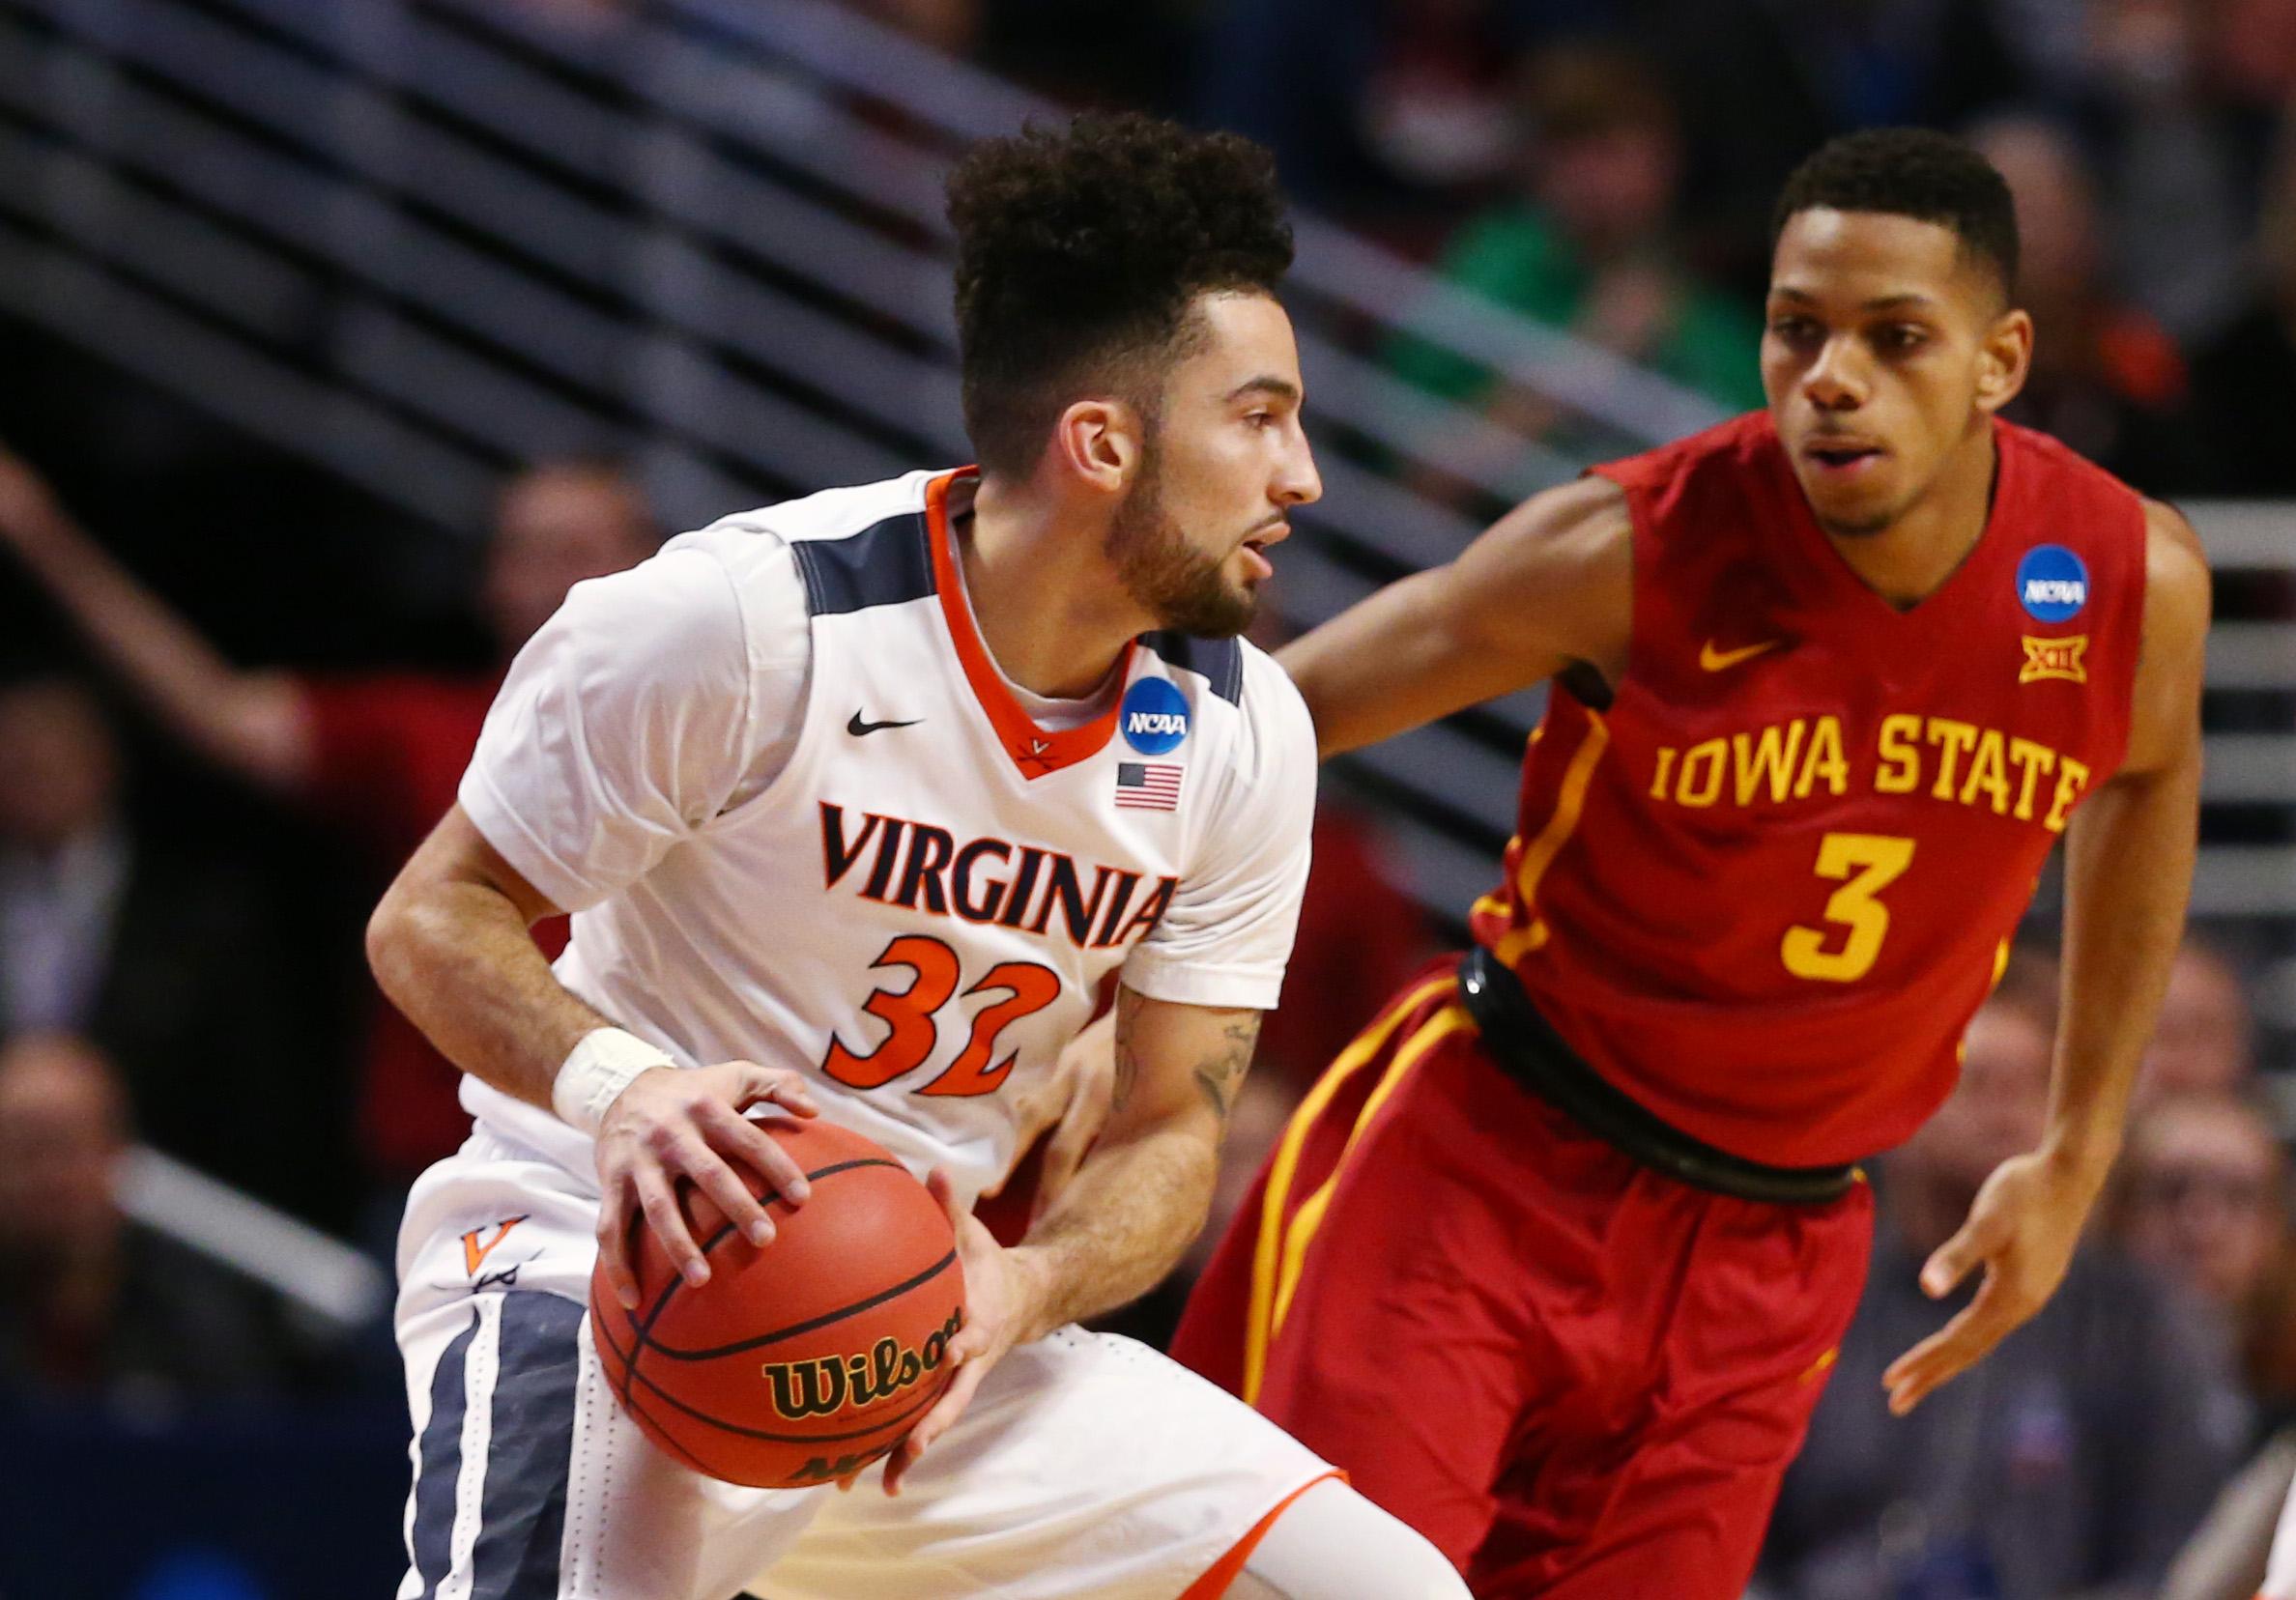 Syracuse vs. Virginia 2016 odds: Cavaliers favored vs. Orange in Elite Eight clash